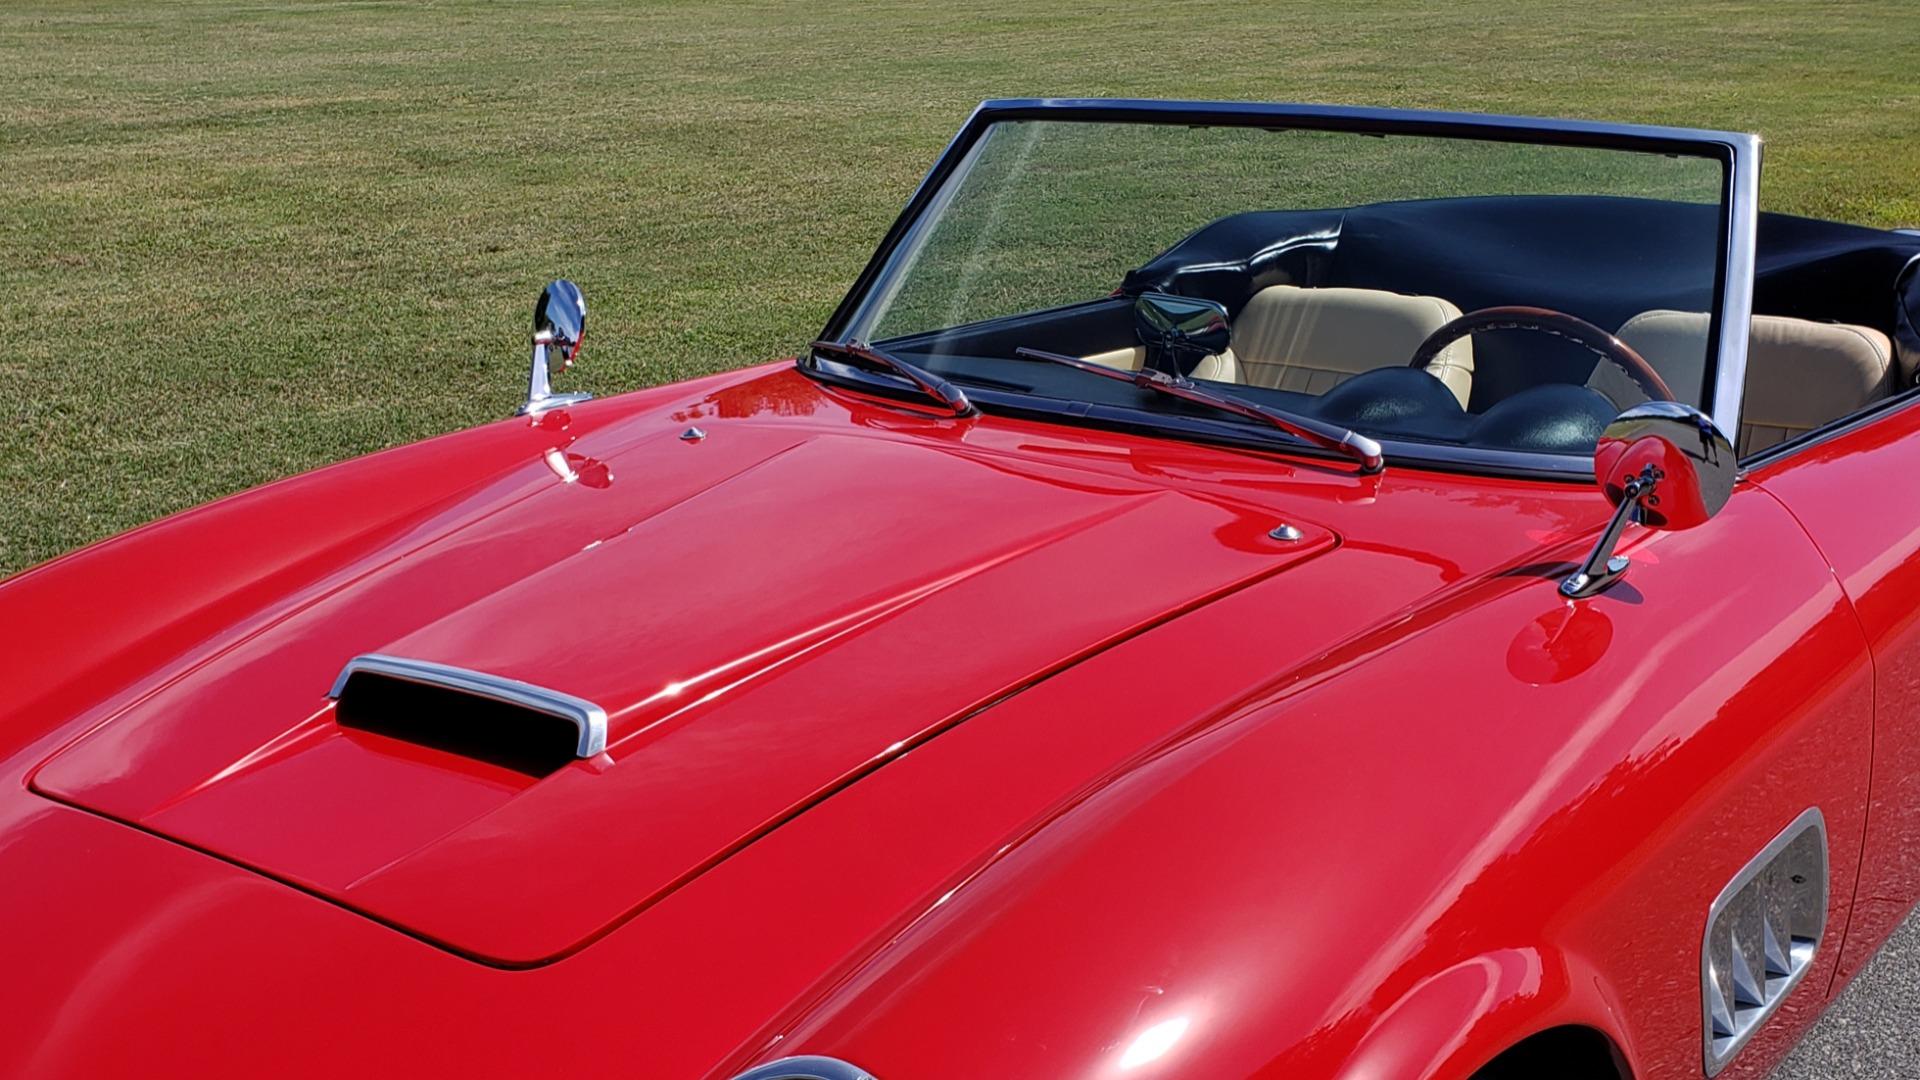 Used 1961 Ferrari 250GT SWB CALIFORNIA REPLICA / 302CI V8 / TREMEC 5-SPEED for sale Sold at Formula Imports in Charlotte NC 28227 16